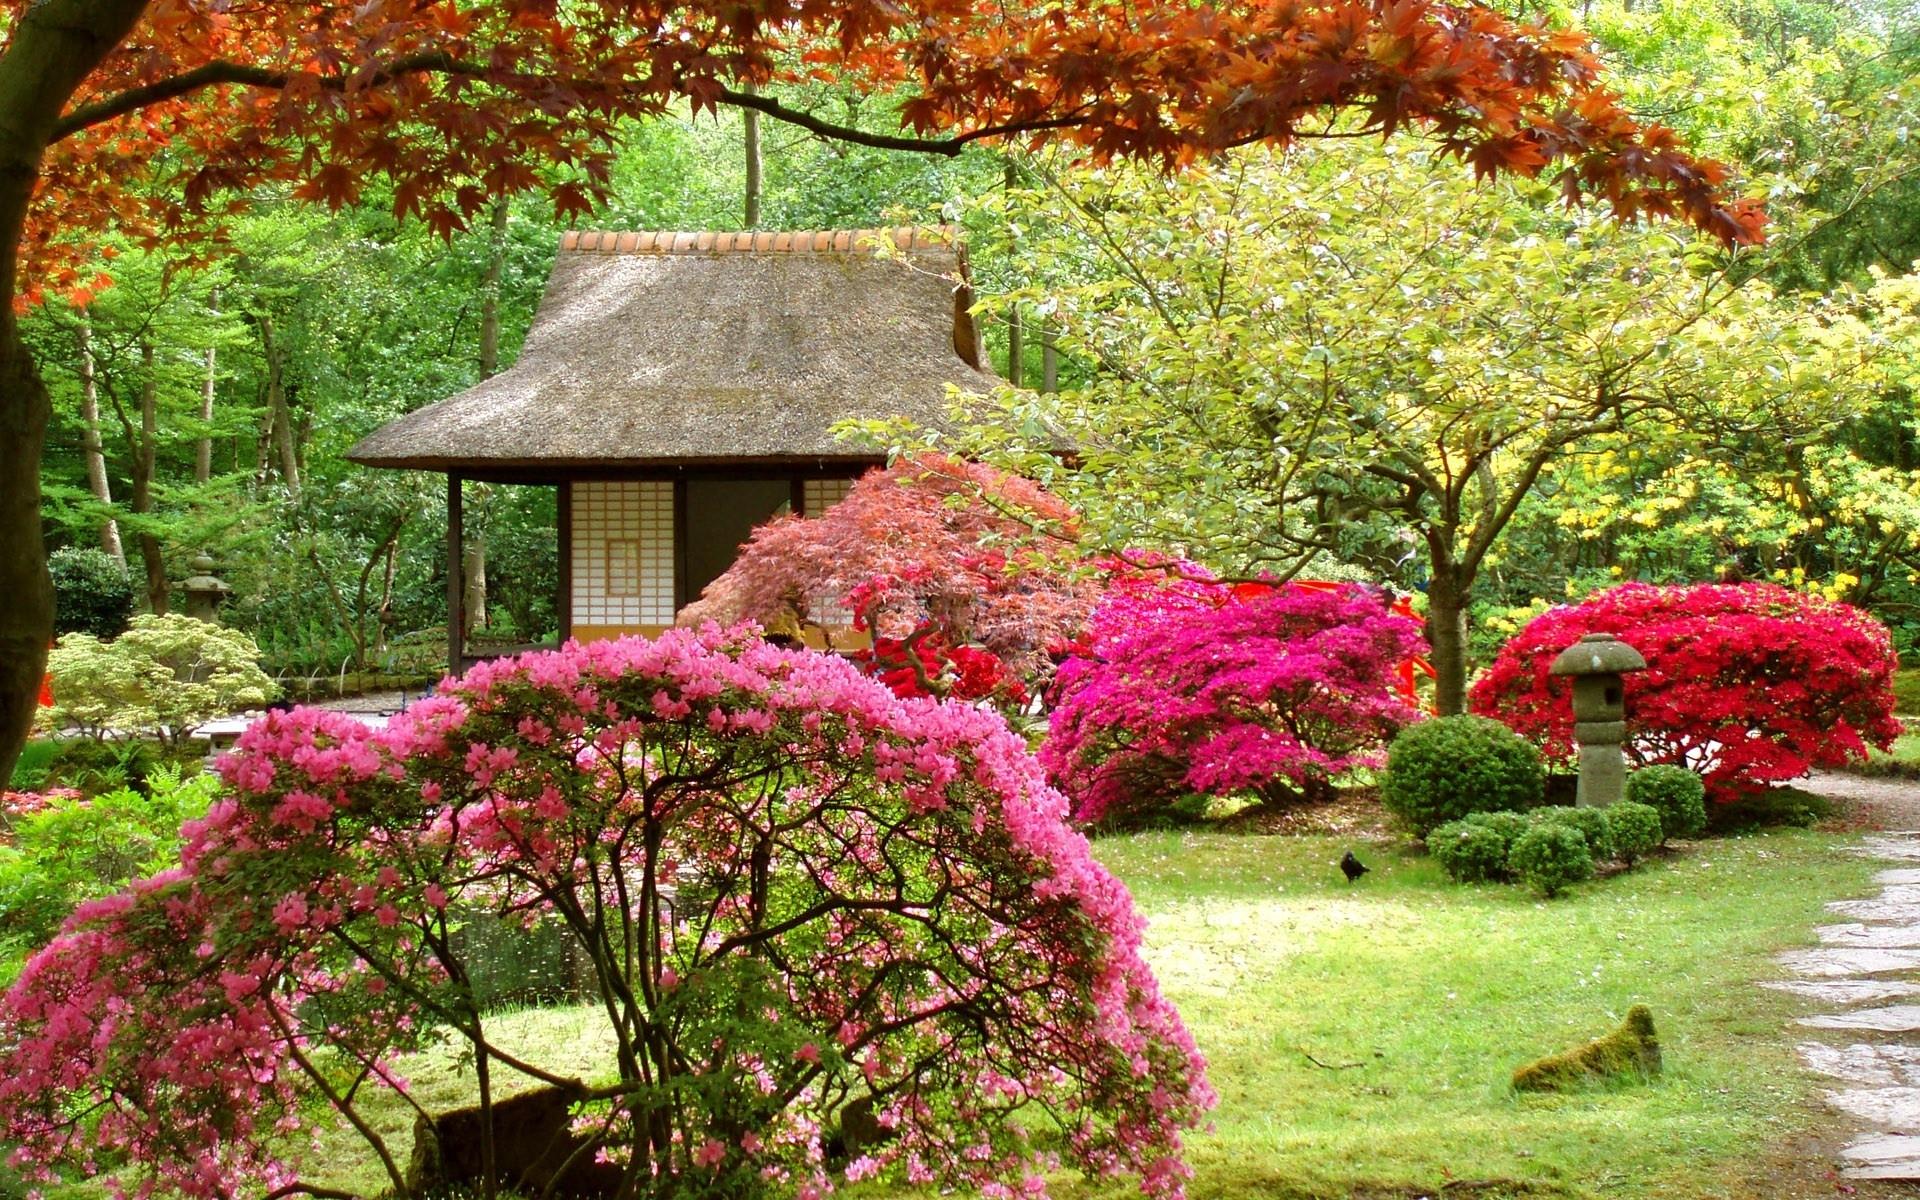 japan flowers spring japanese garden asian wallpaper background 1920x1200